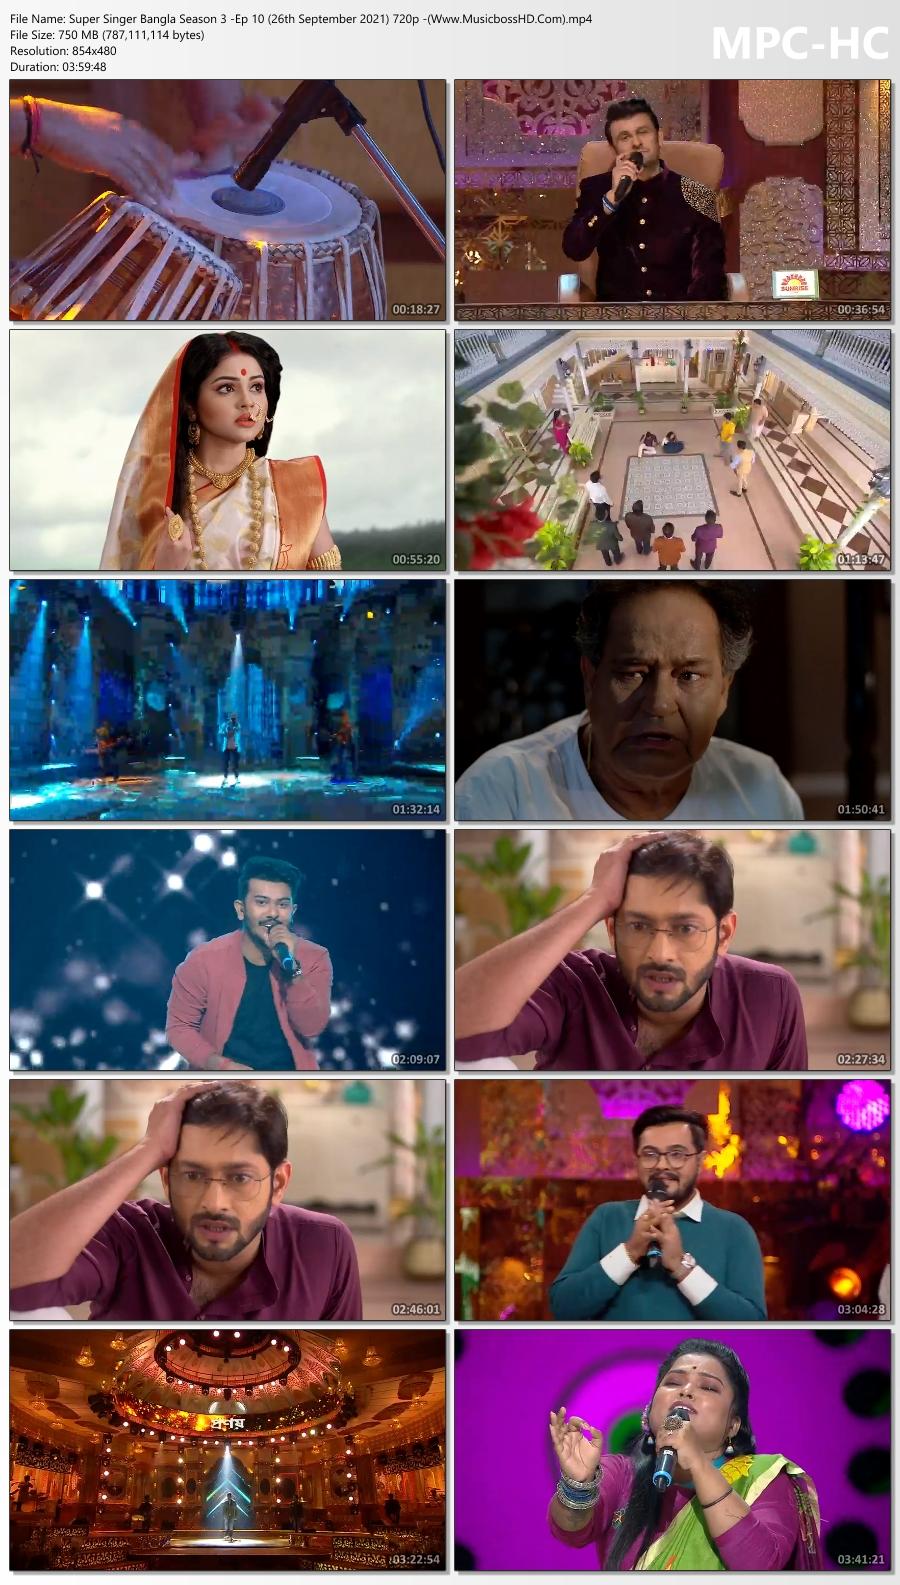 Super-Singer-Bangla-Season-3-Ep-10-26th-September-2021-720p-Www-Musicboss-HD-Com-mp4-thumbs